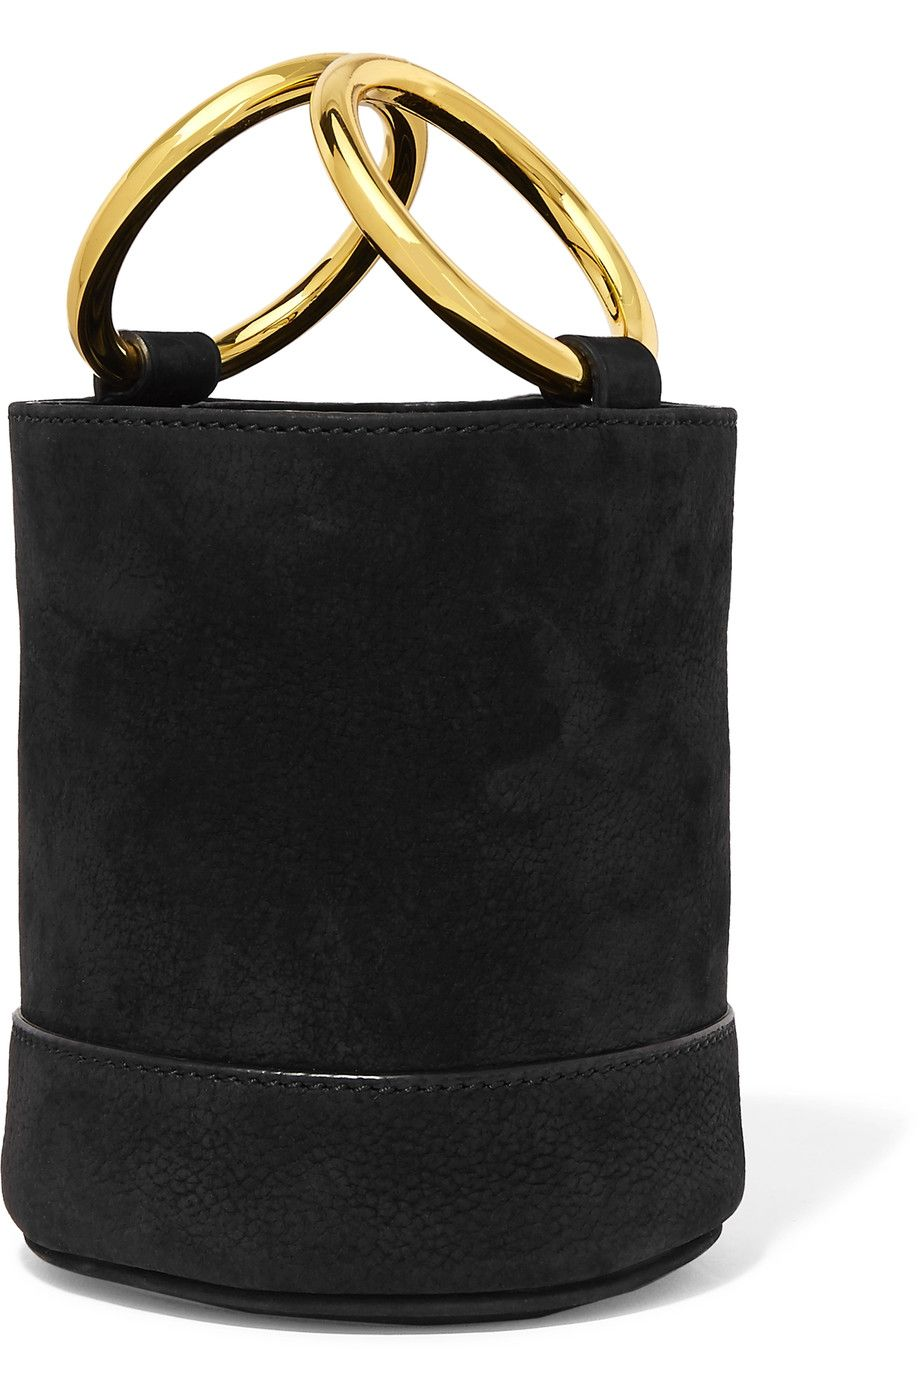 Simon Porter Bag Net MillerBonsai Bucket Nubuck 15 Mini A 8nw8xrPq